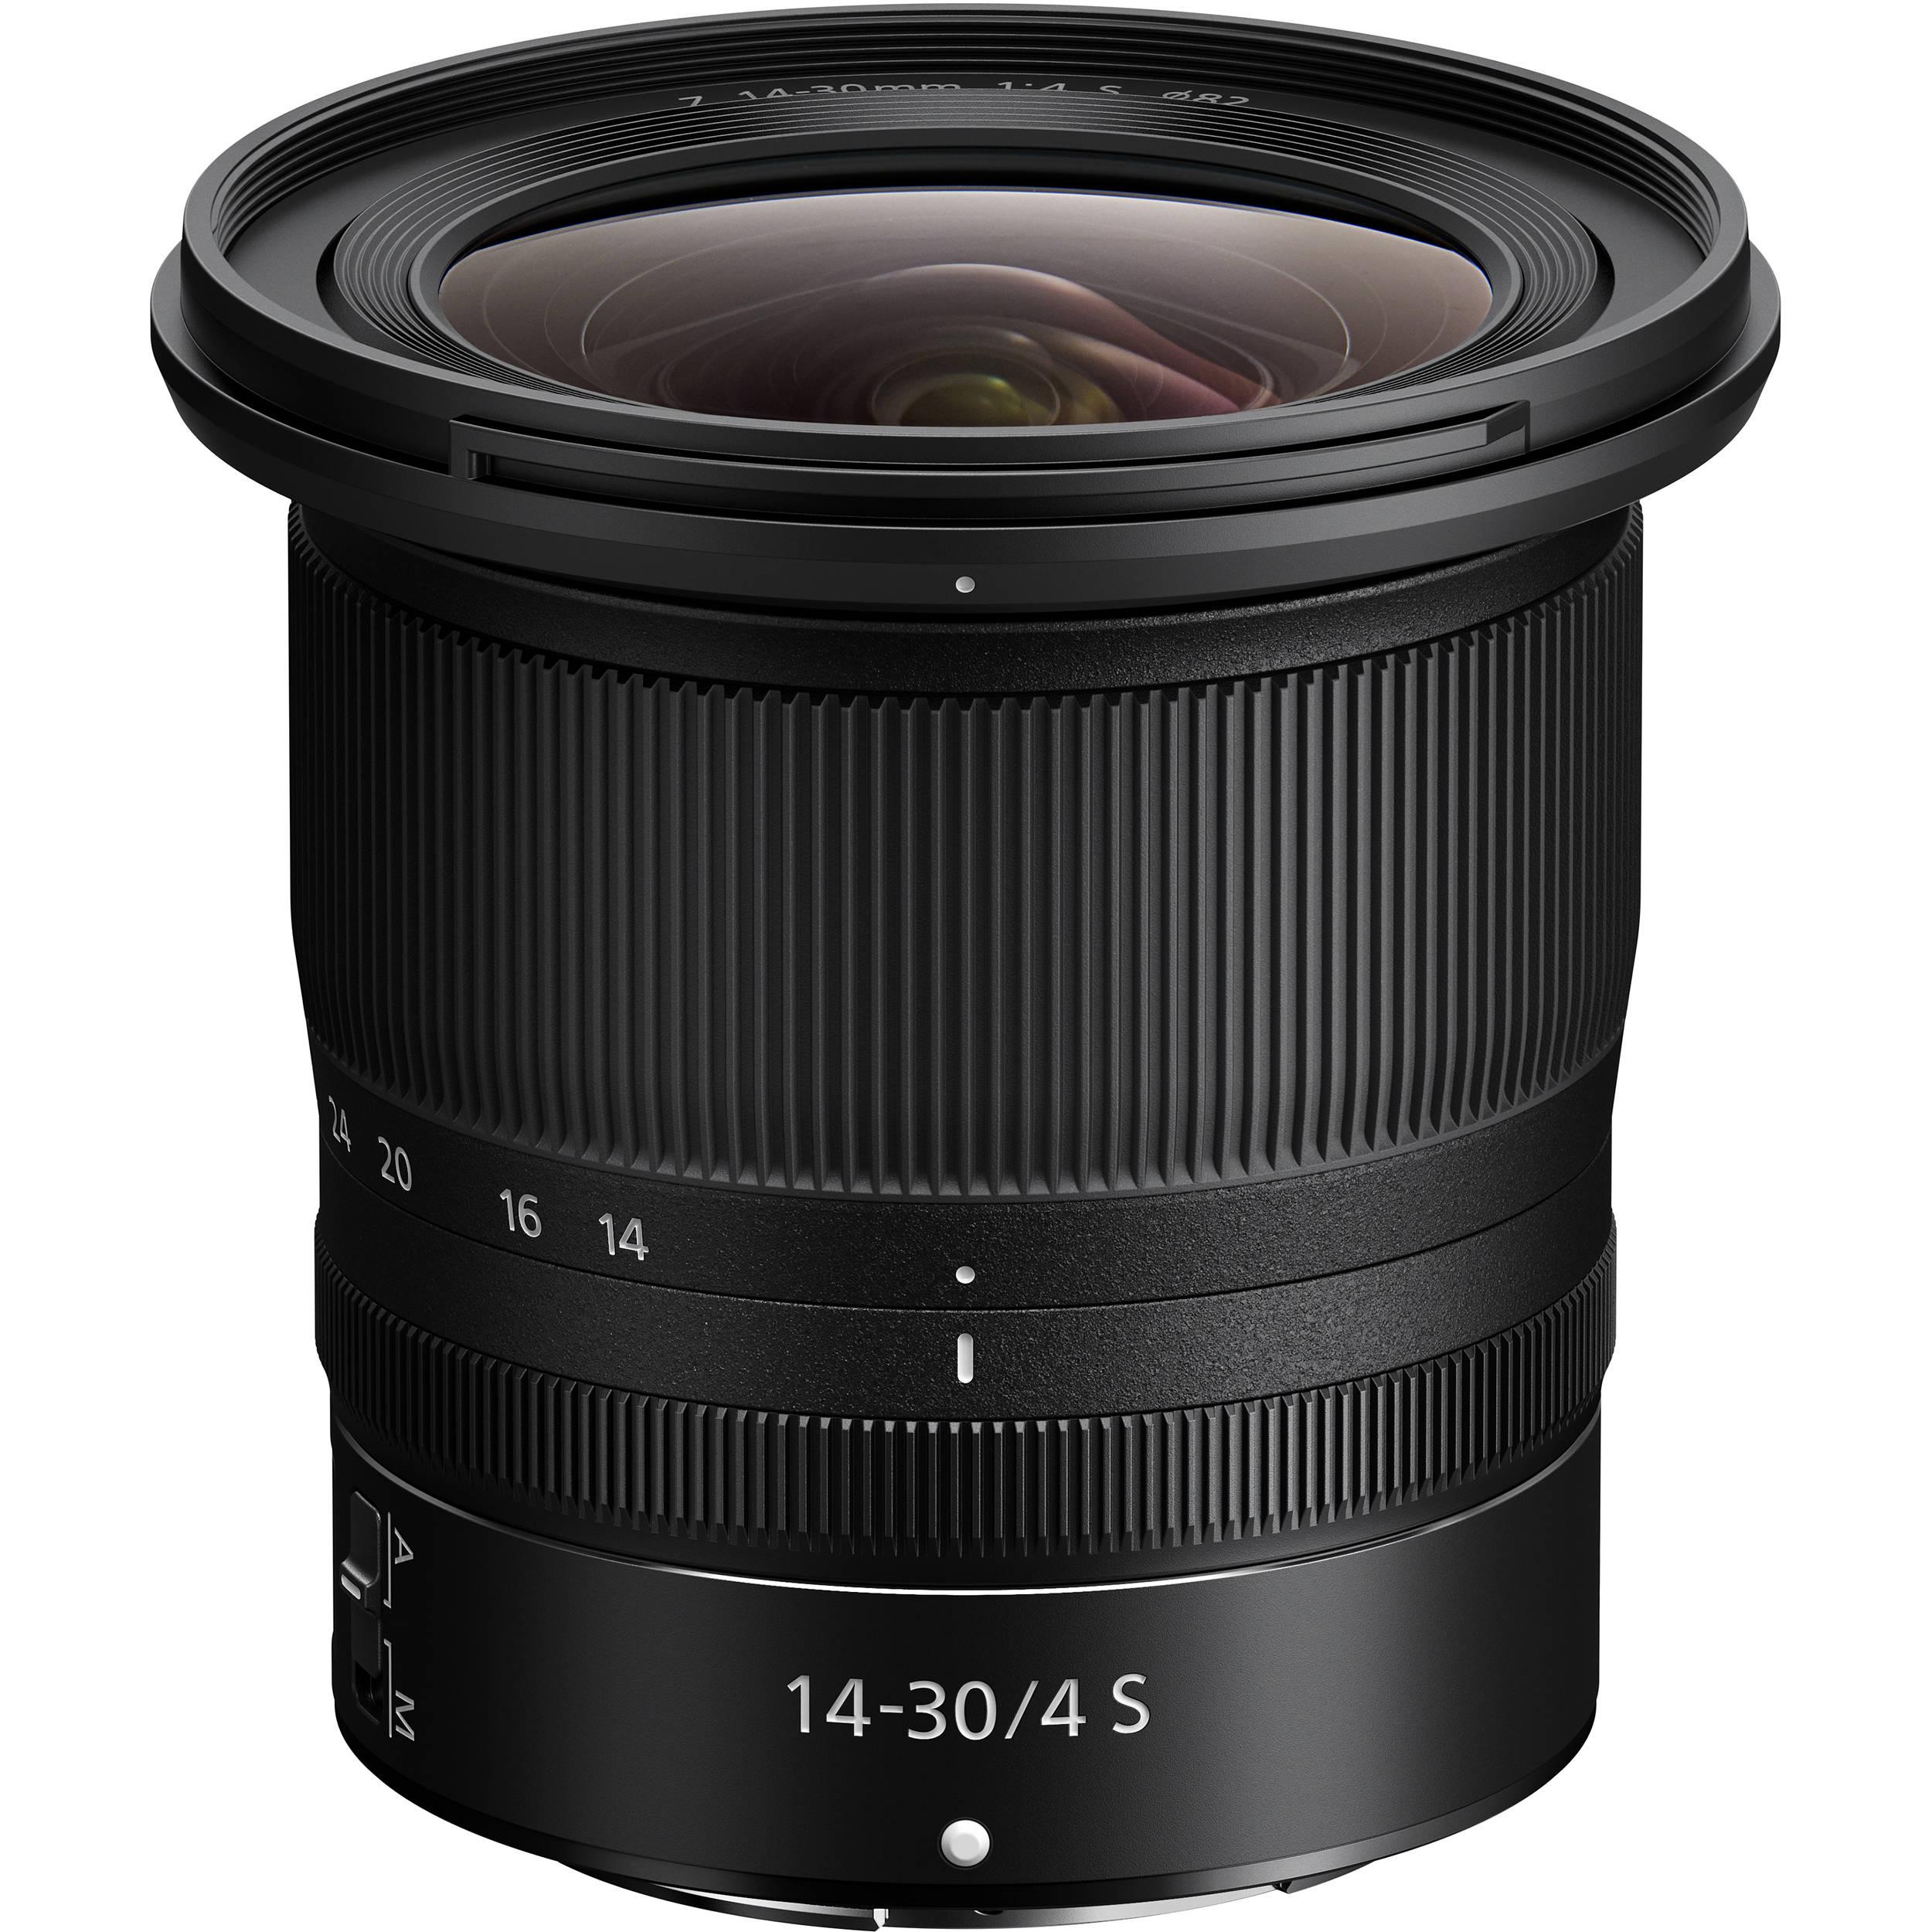 c3f1d419b641 Nikon NIKKOR Z 14-30mm f 4 S Lens 20070 B H Photo Video